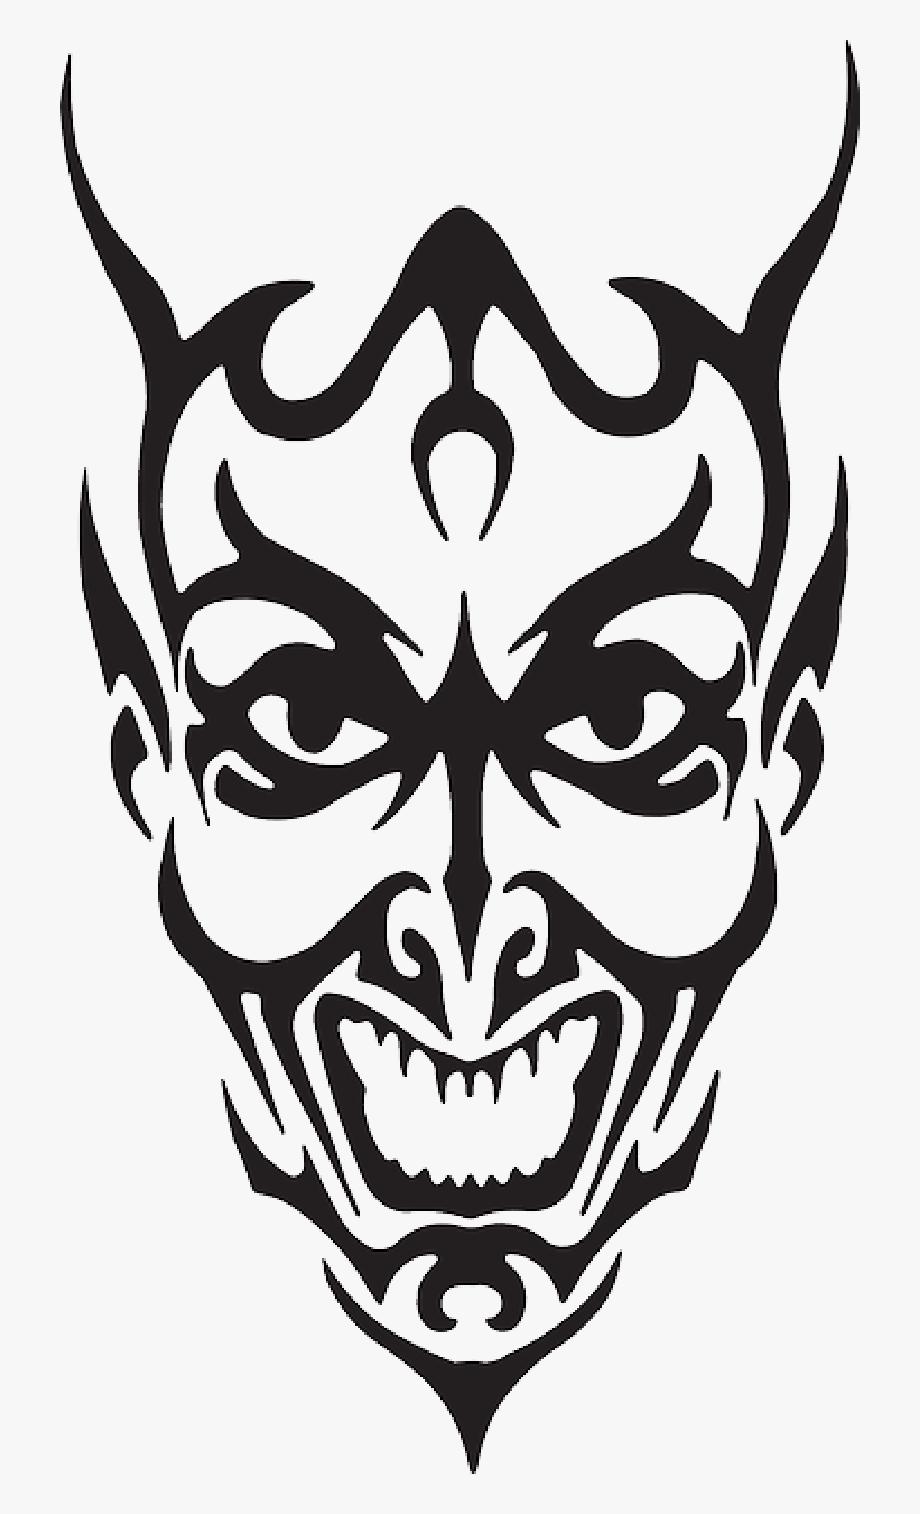 Devil clipart devil face. Demon black and white